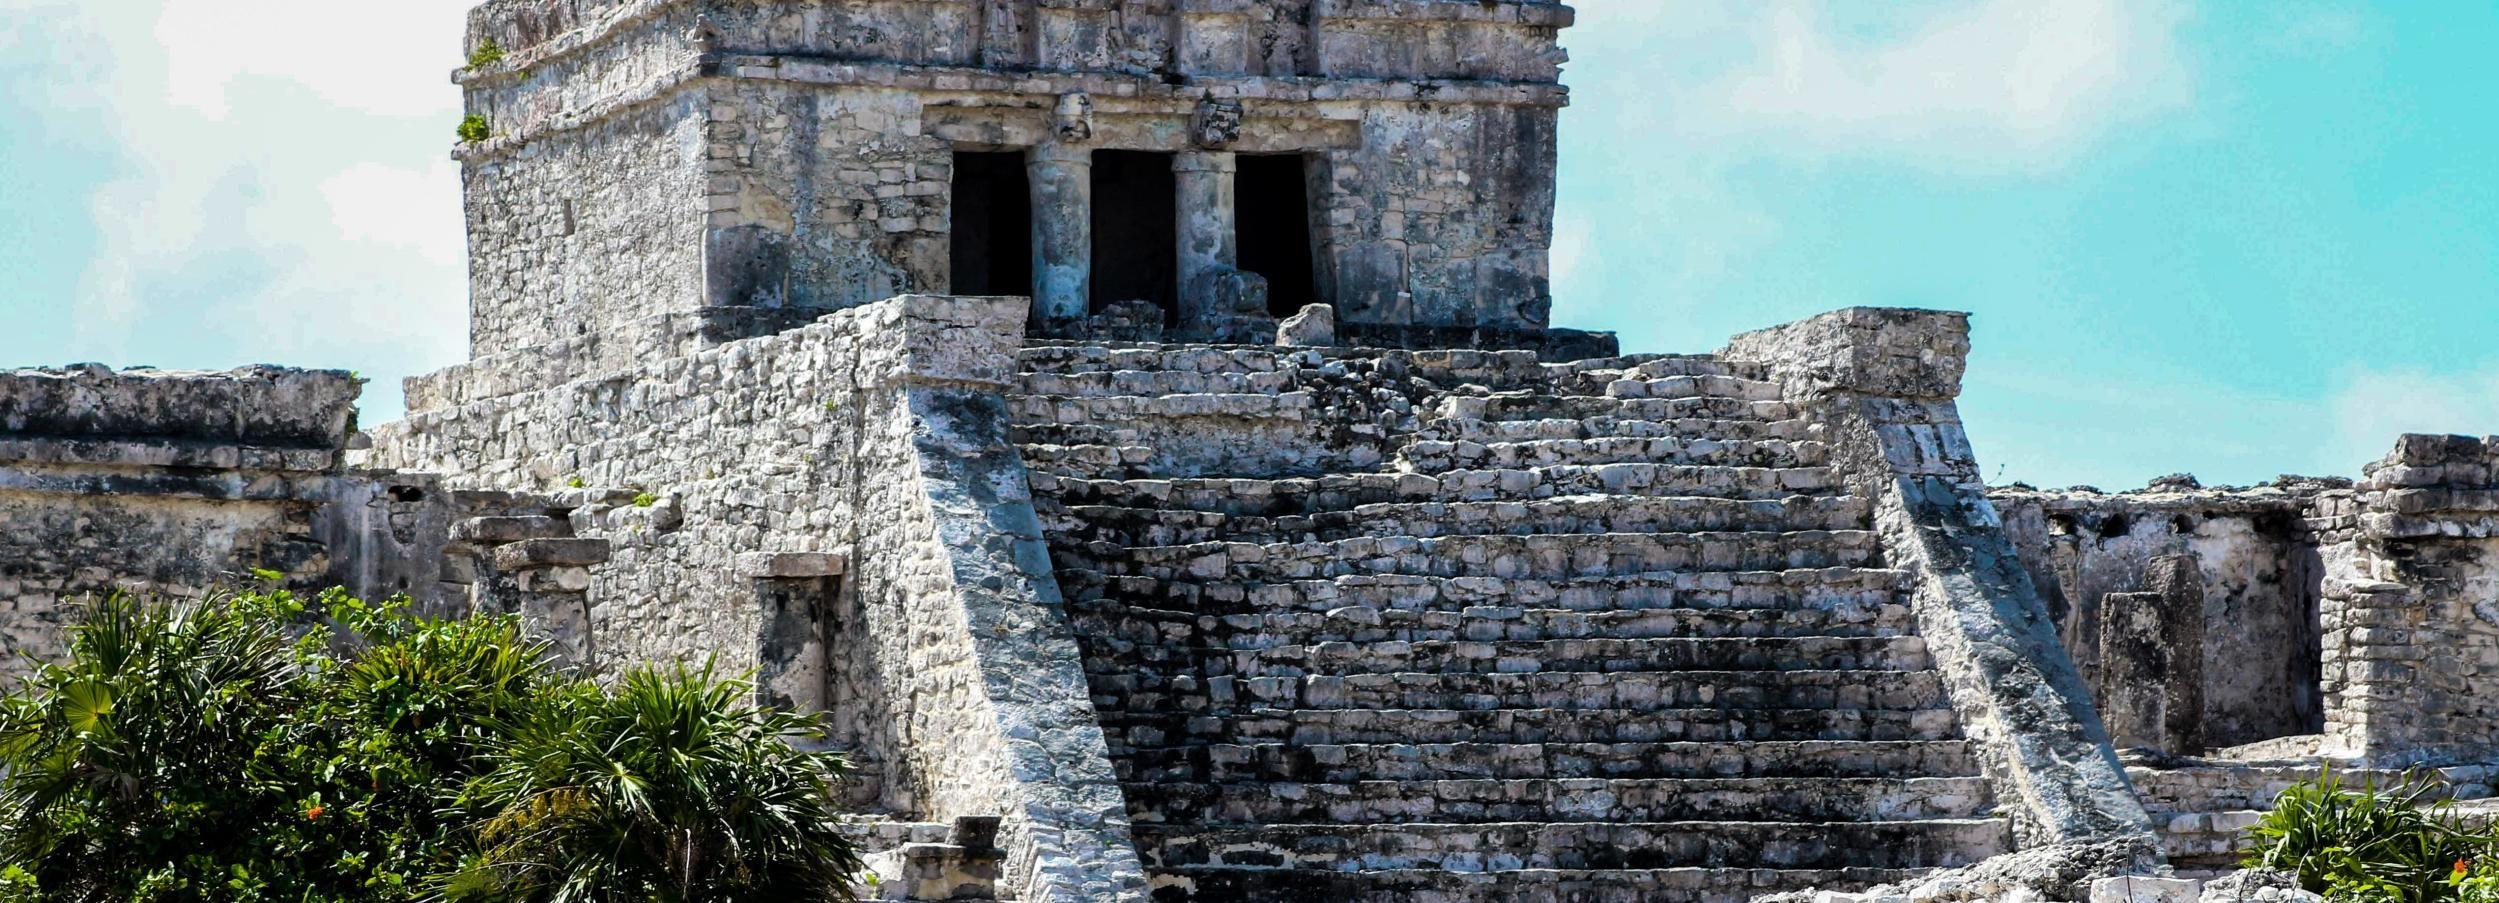 Tulum, Cobá & Hilario-Höhle: Tagestour mit Transfer-Optionen